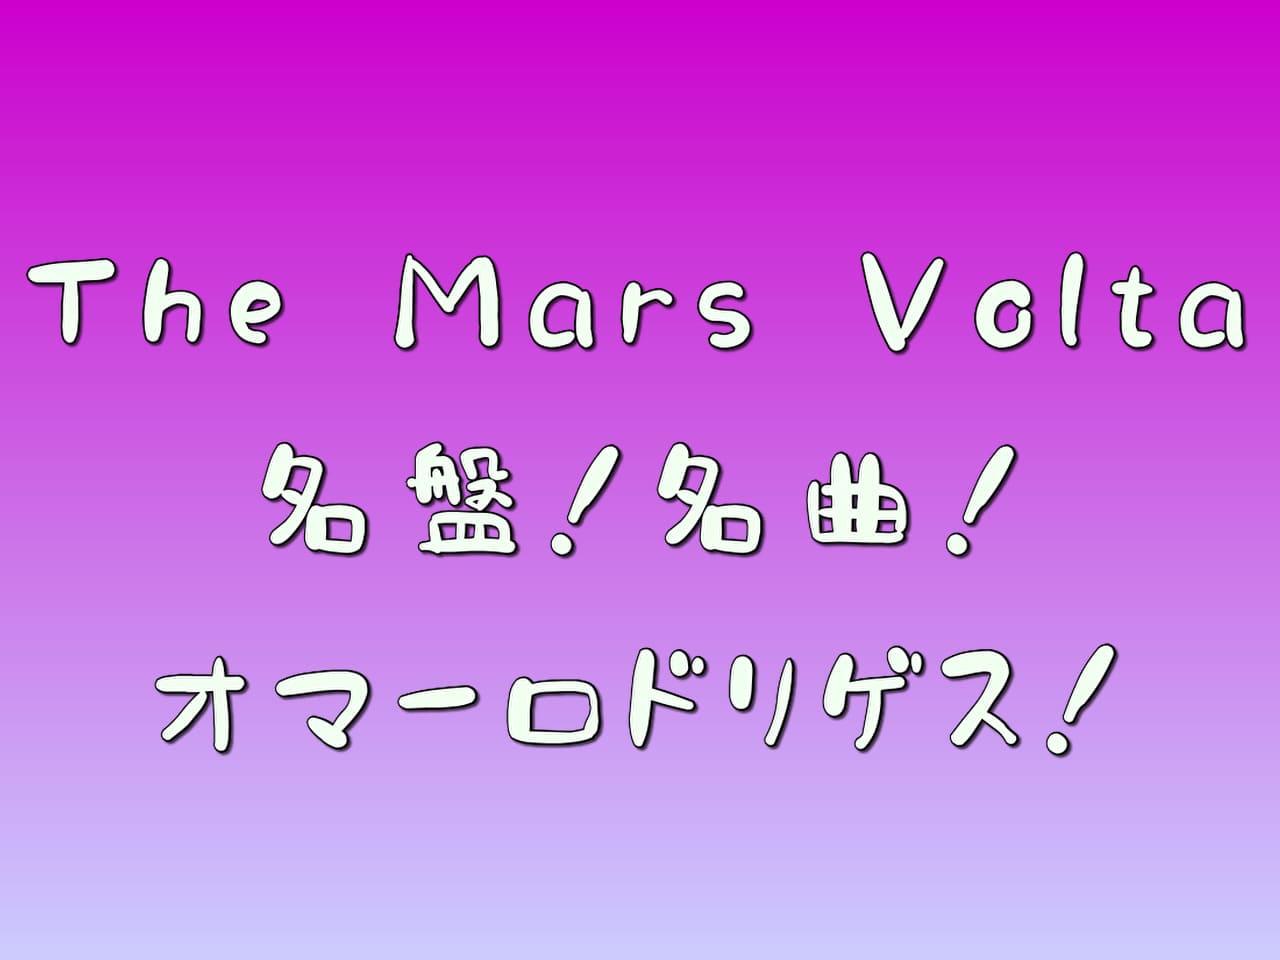 The Mars Volta名盤!名曲!オマーロドリゲス!